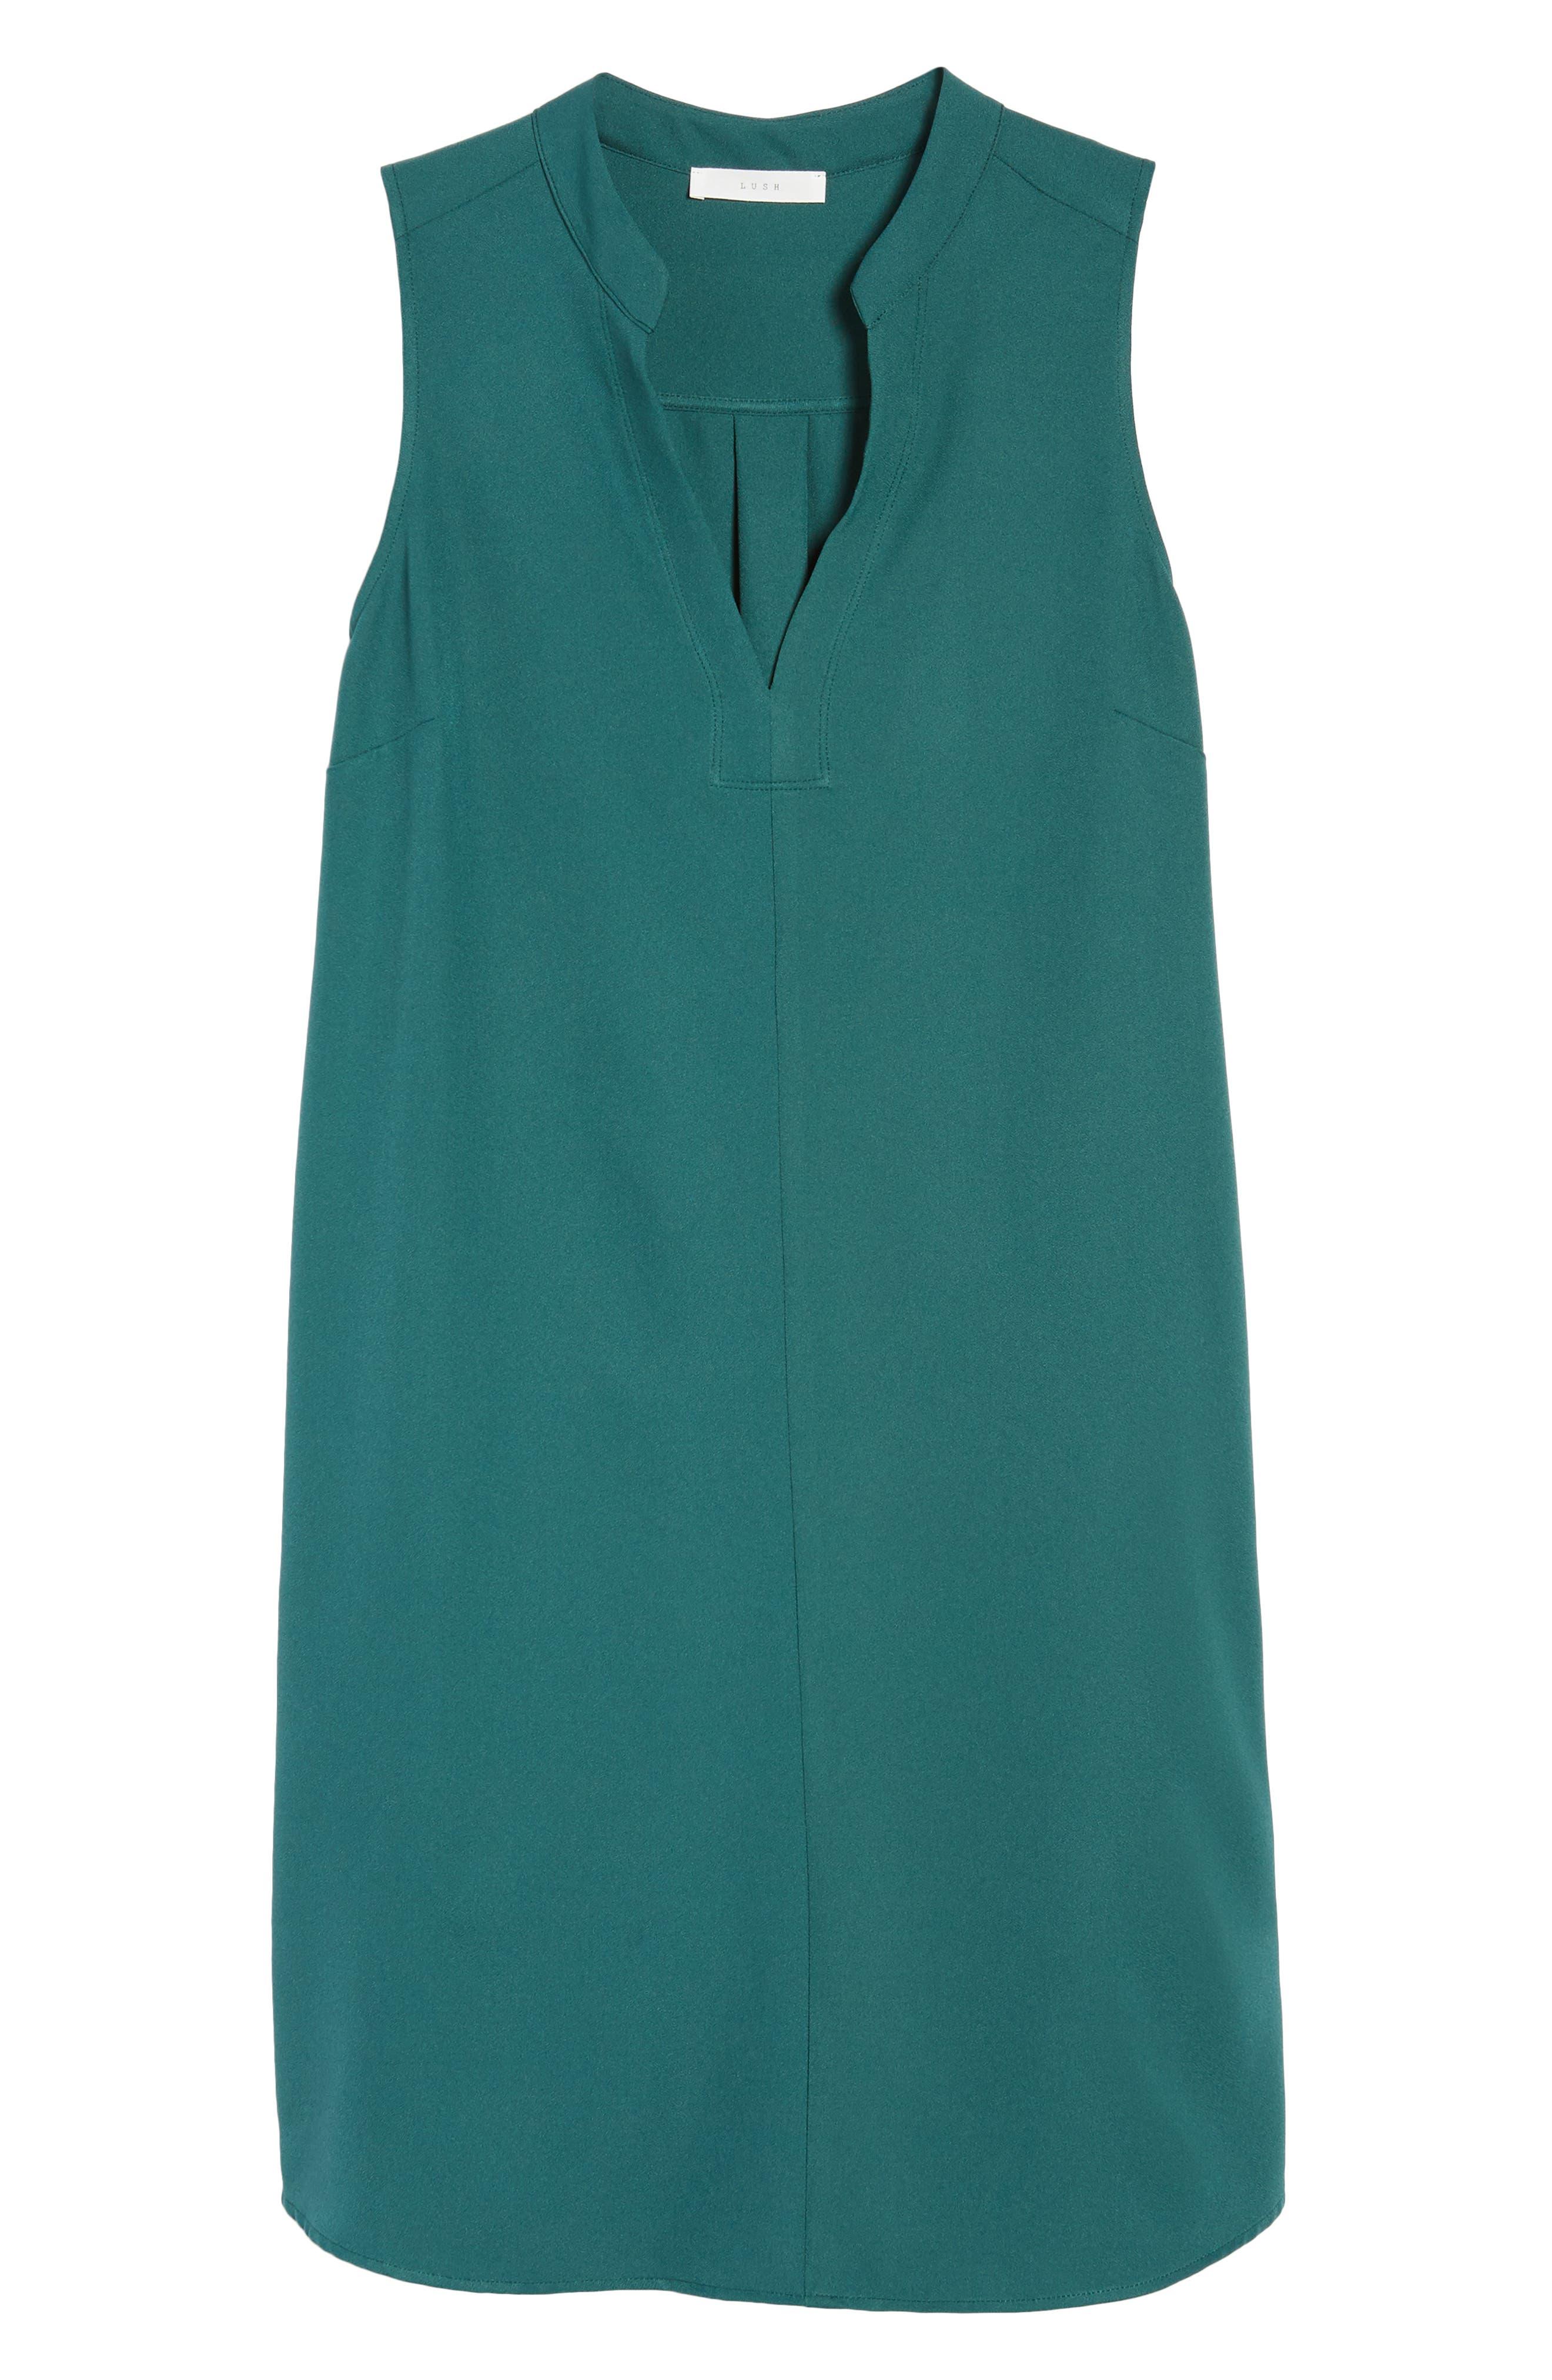 Taylor Shift Dress,                             Alternate thumbnail 6, color,                             Green Bug